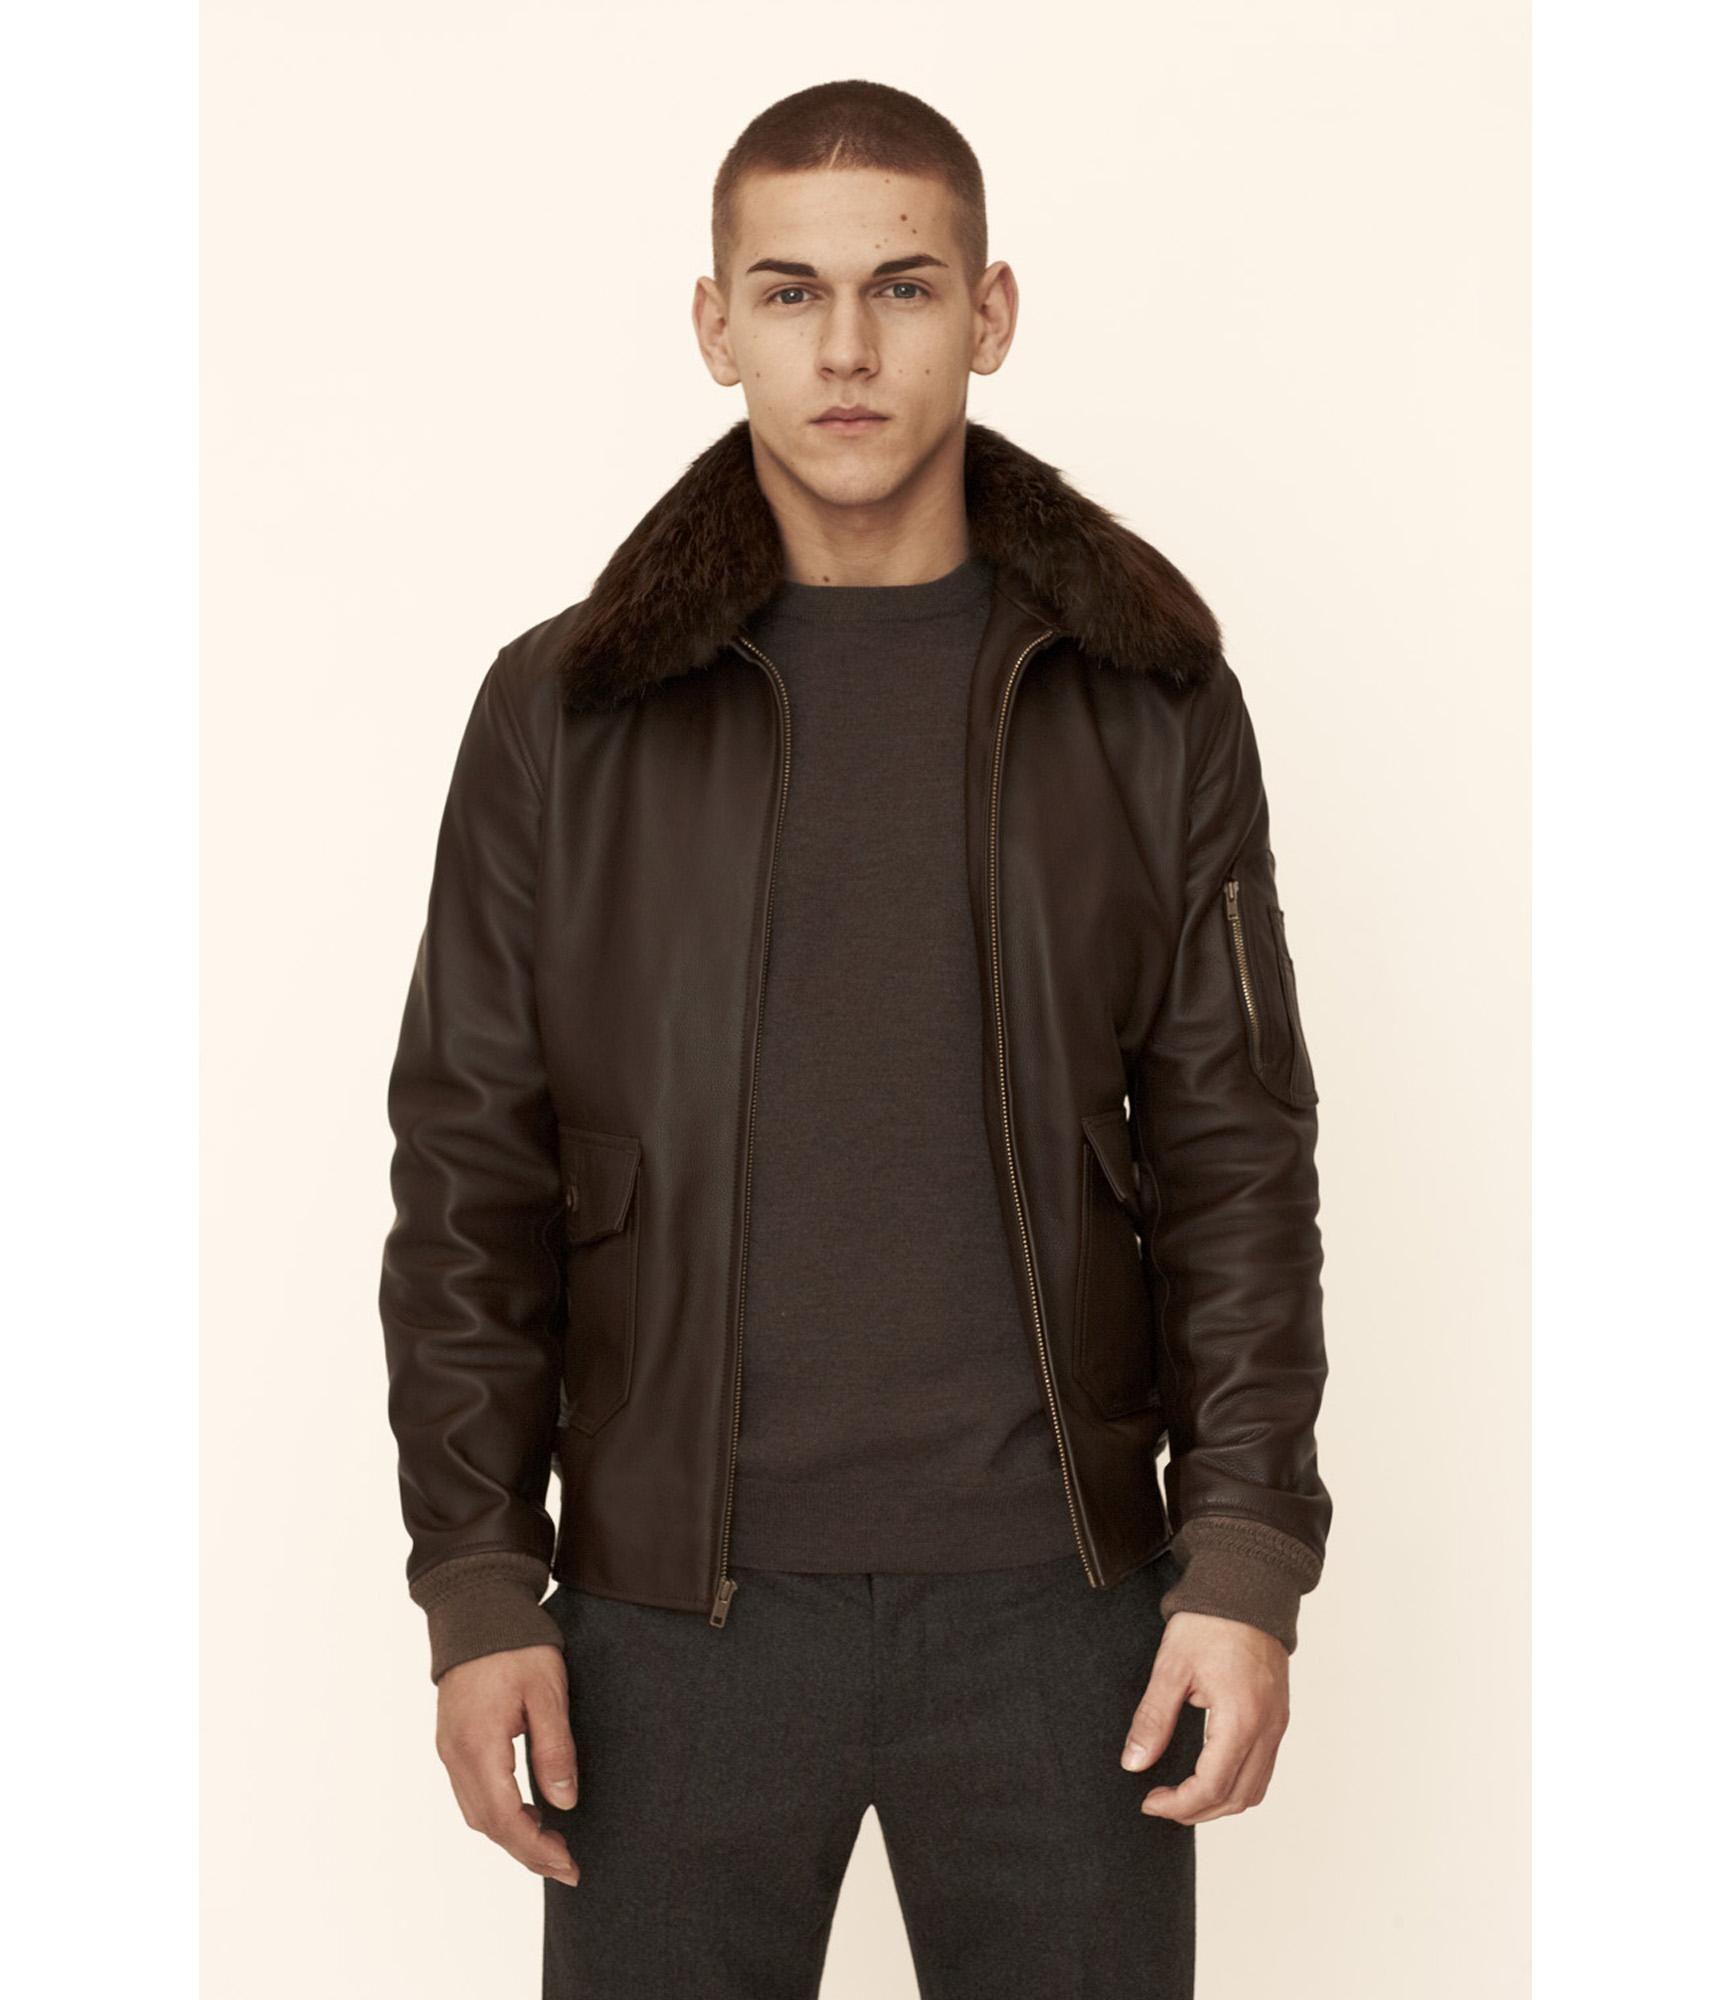 1adfc53e15 APC Louis W - Aviator jacket | Clothing Style | Aviator jackets ...